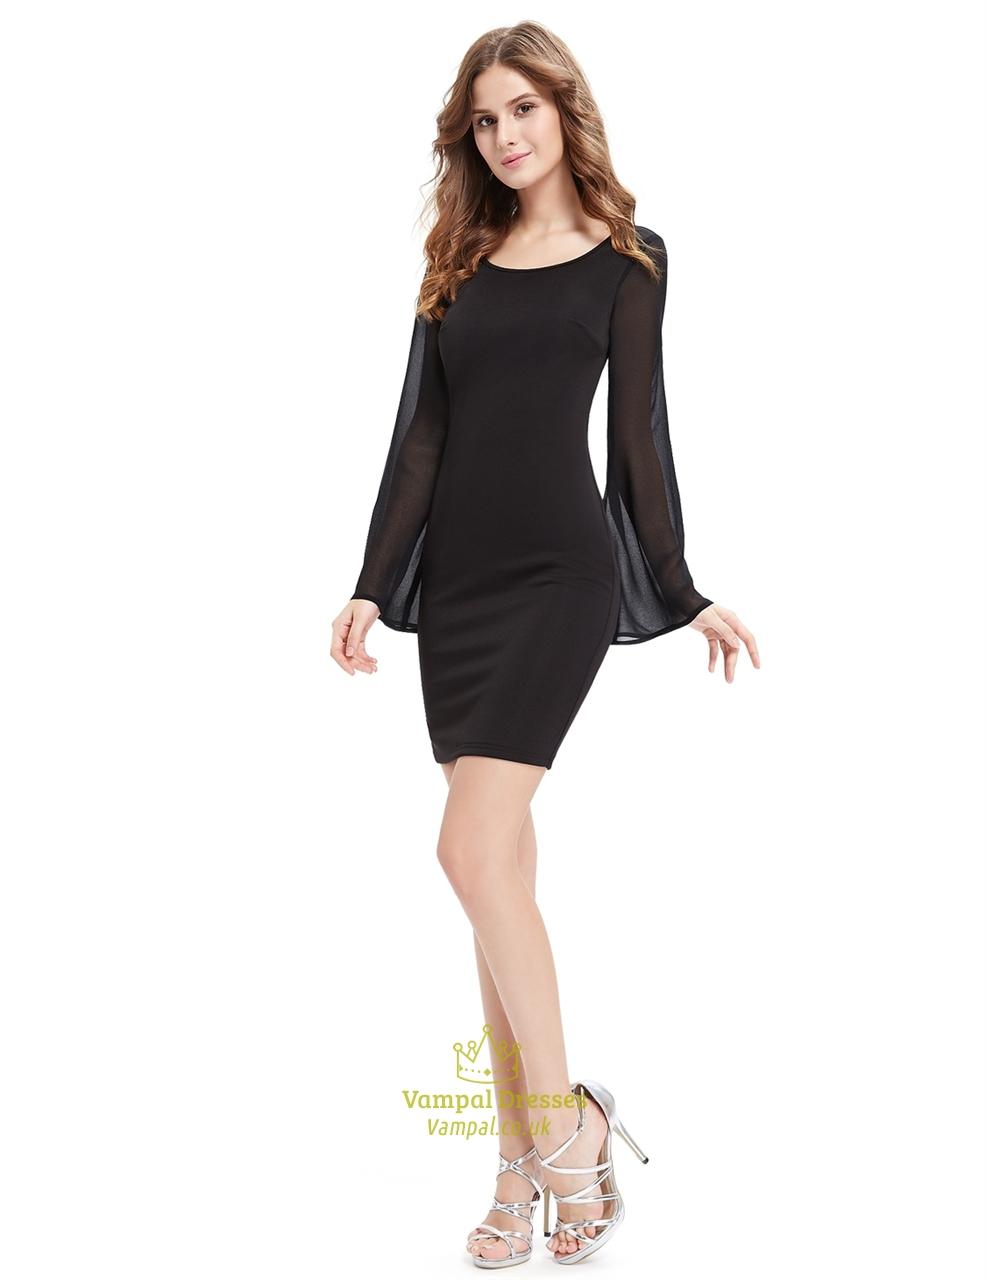 Black Short Sheath Cocktail Dresses With Bell Sleeve | Vampal Dresses